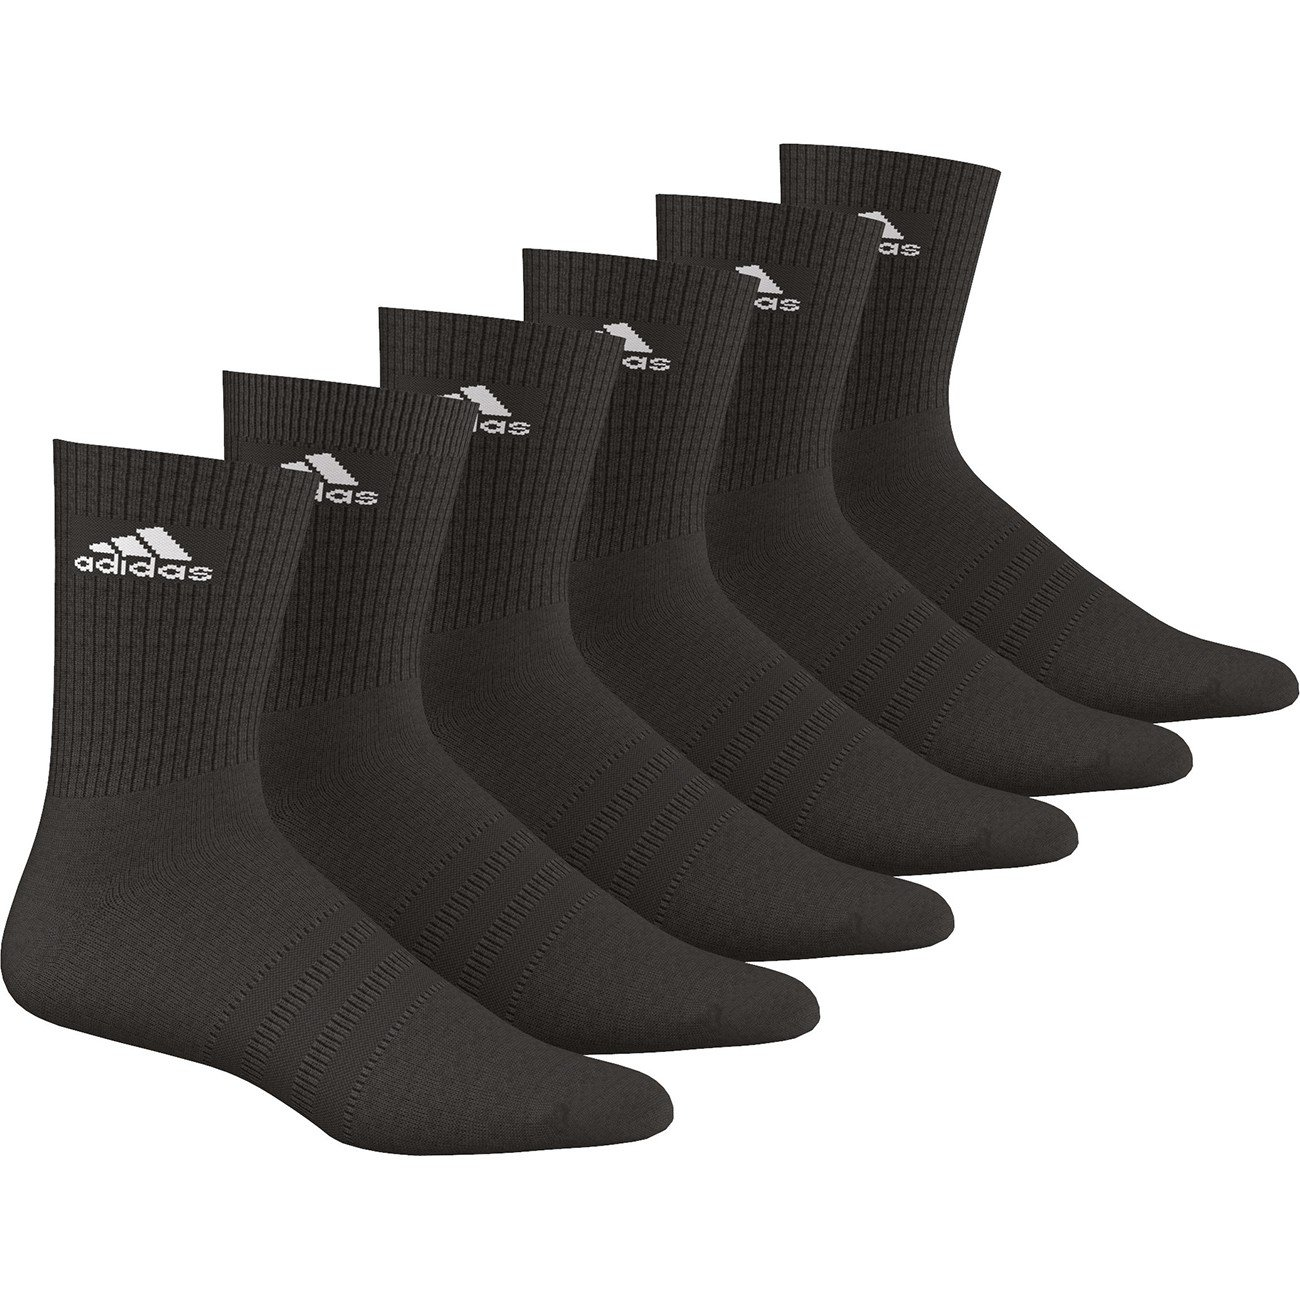 Adidas Unisex Socken Socken Socken 3-Streifen Crew, 6er-Pack B01BF9BSV4 Sportsocken Qualität ba9408